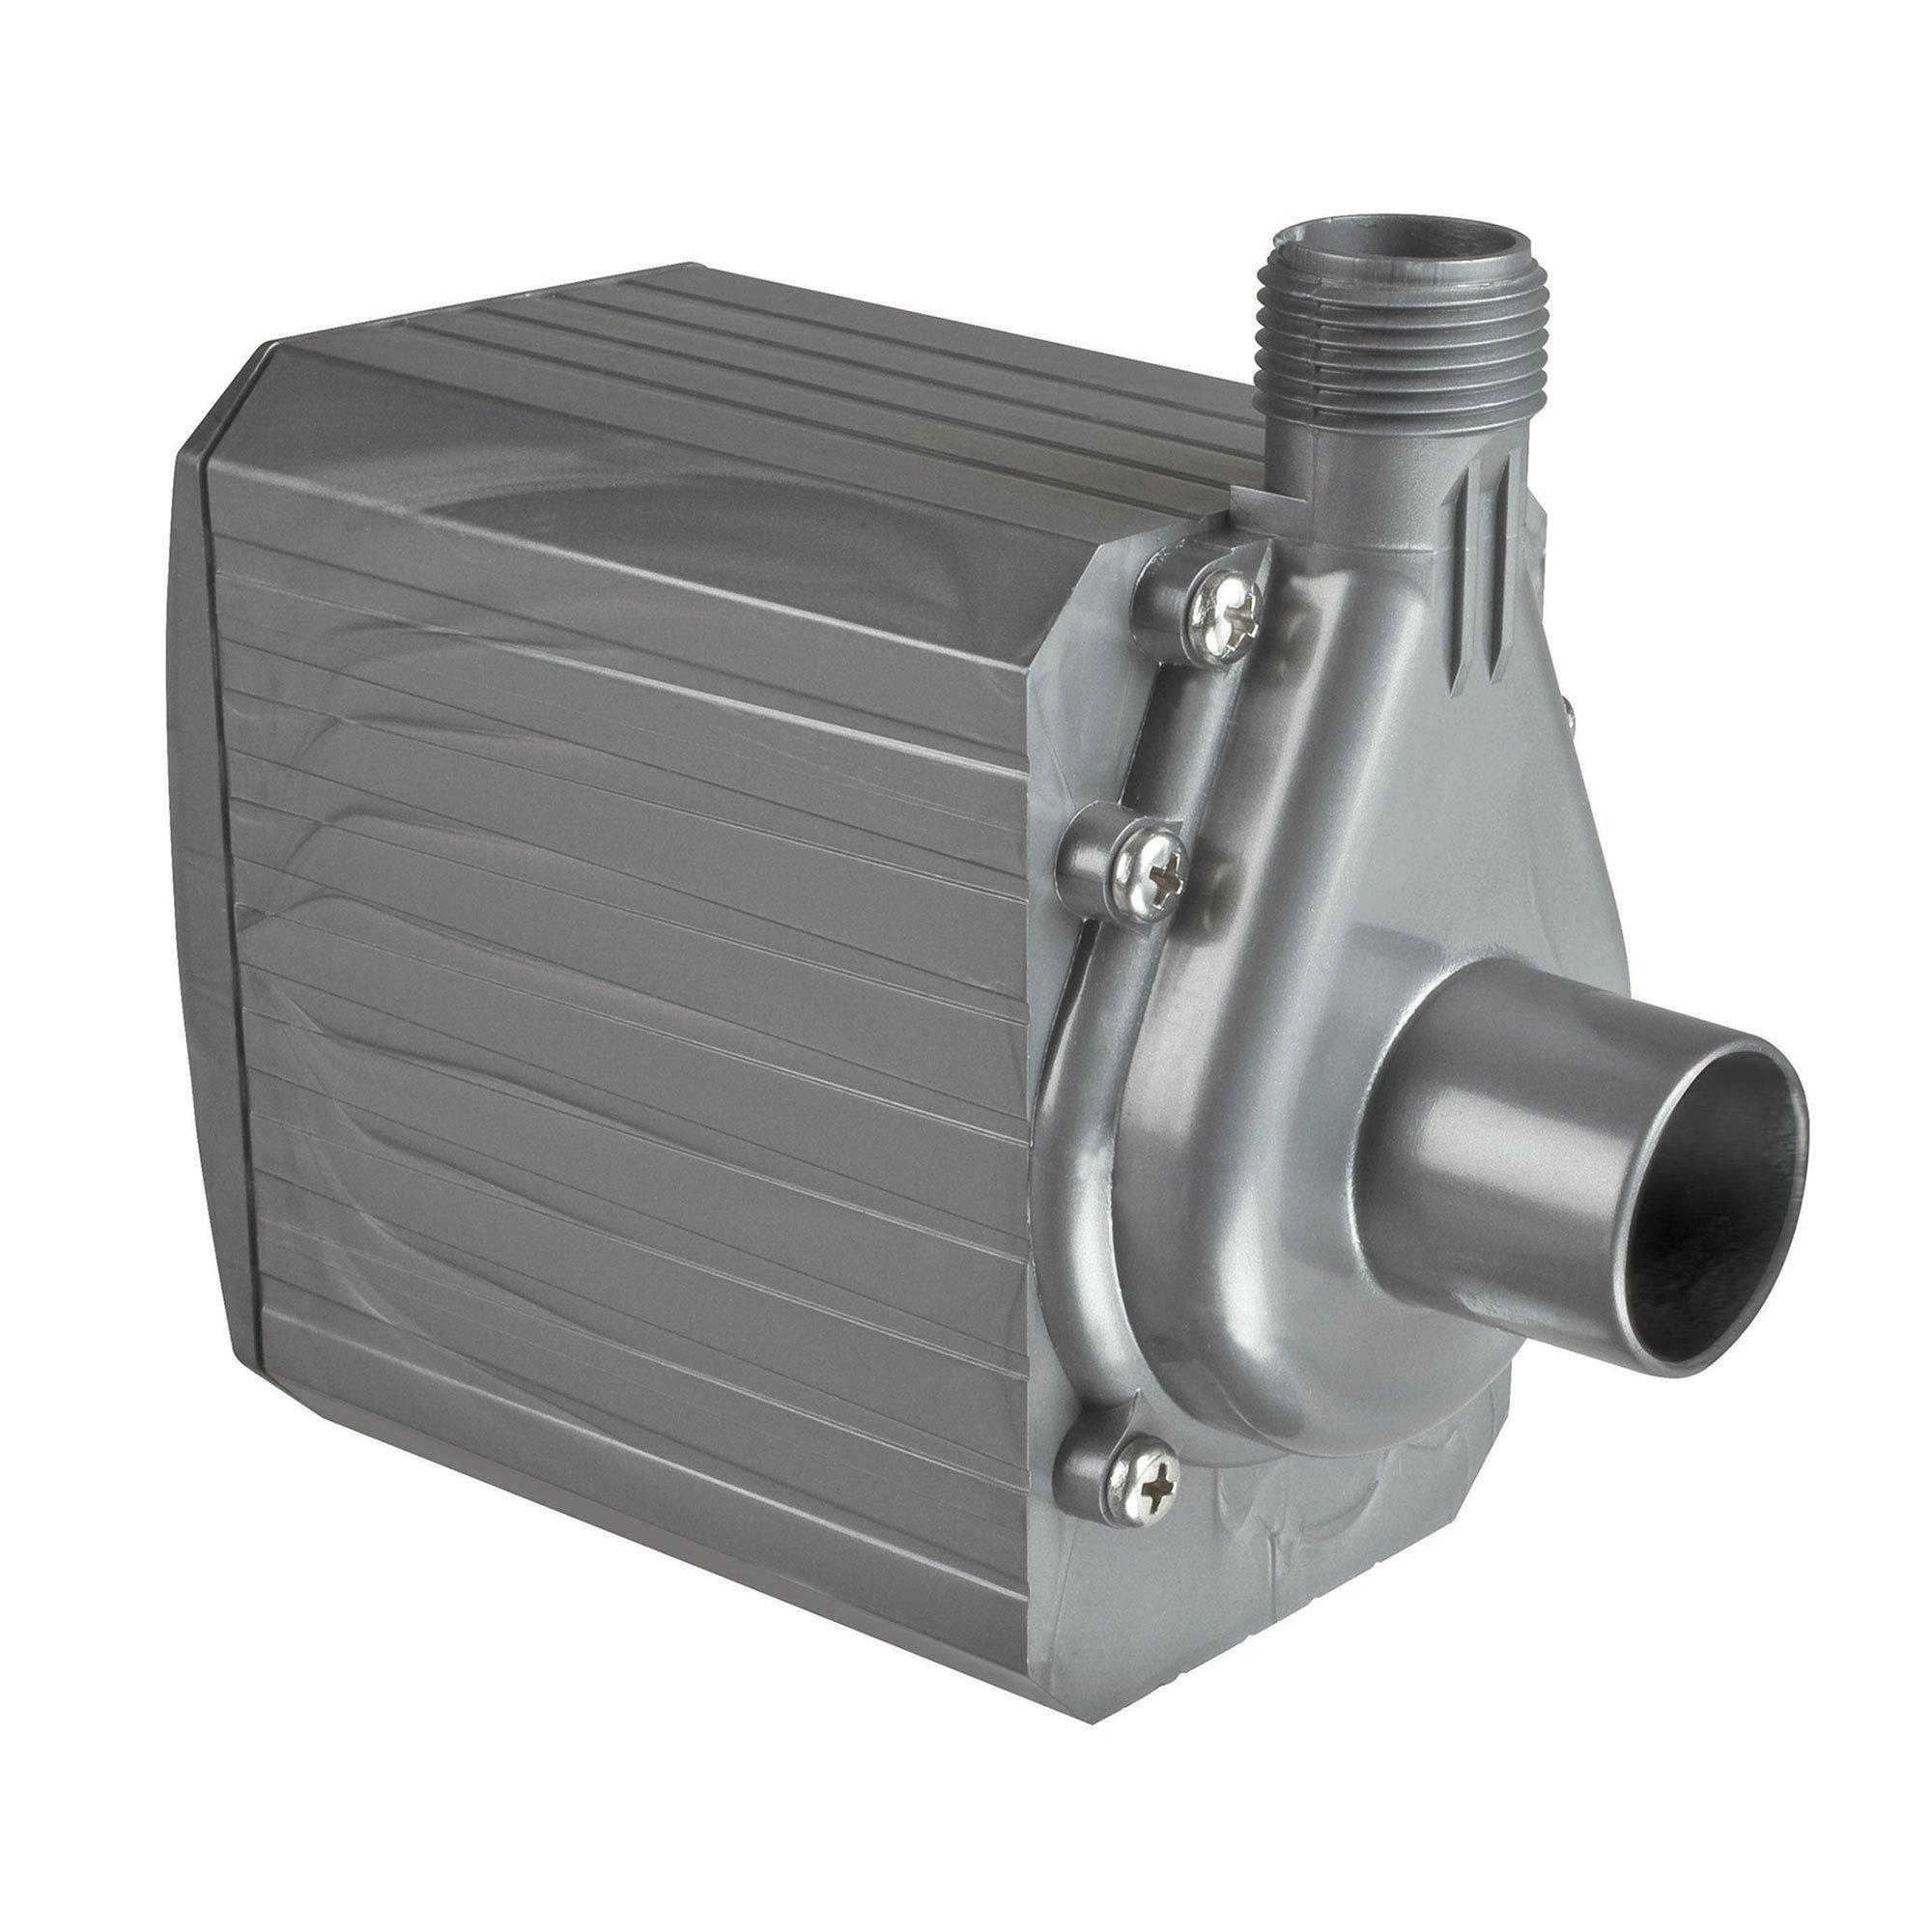 Danner 02720 Pond Mag 9.5 950 GPH Pump by Supreme (Danner Inc)